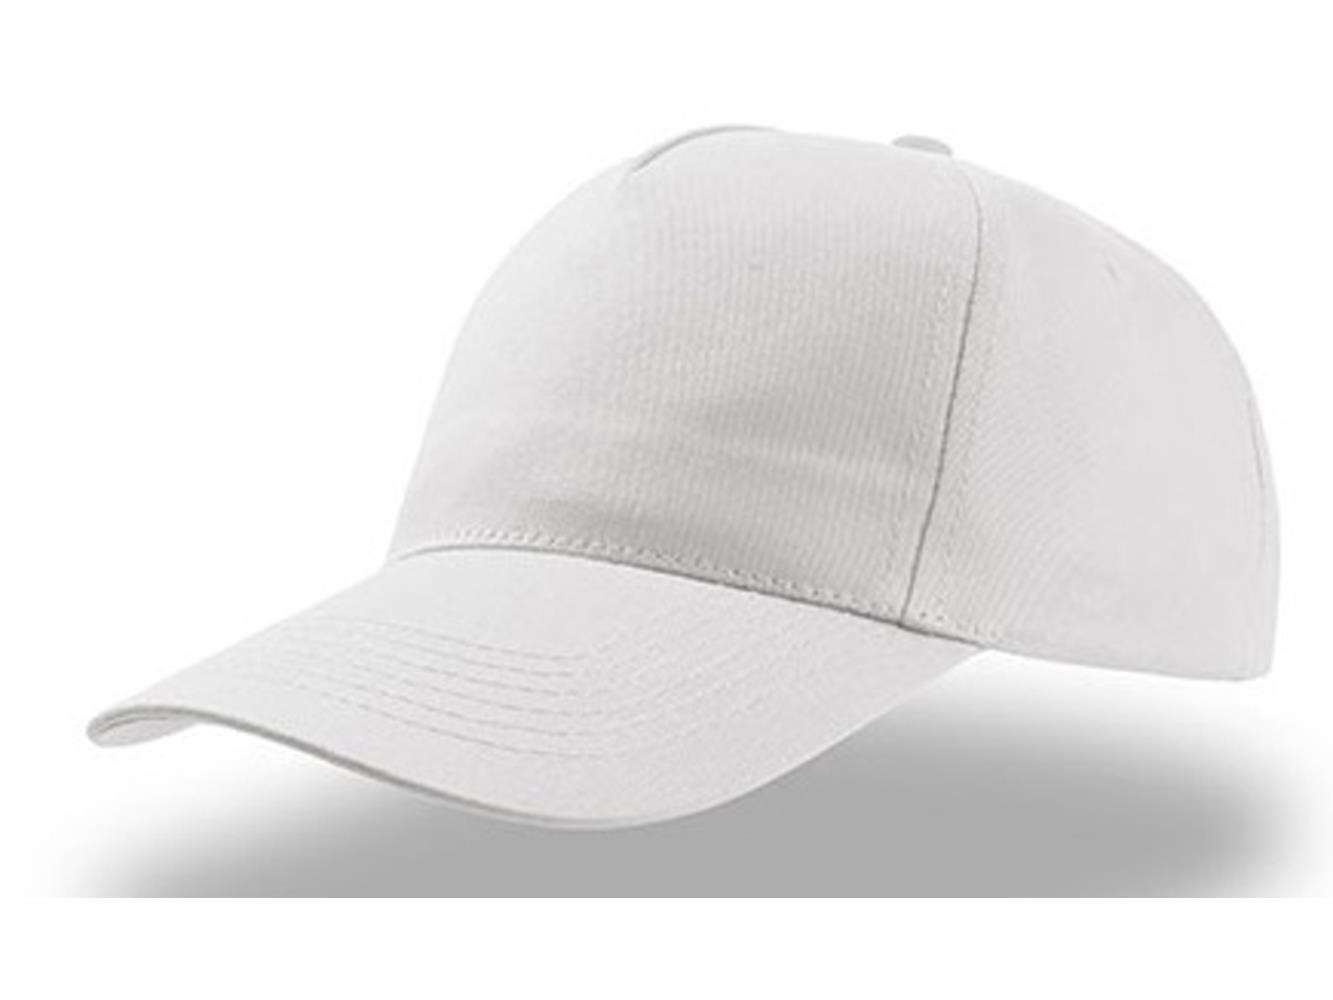 ATELIER DEL RICAMO Cappello Unisex con Visiera